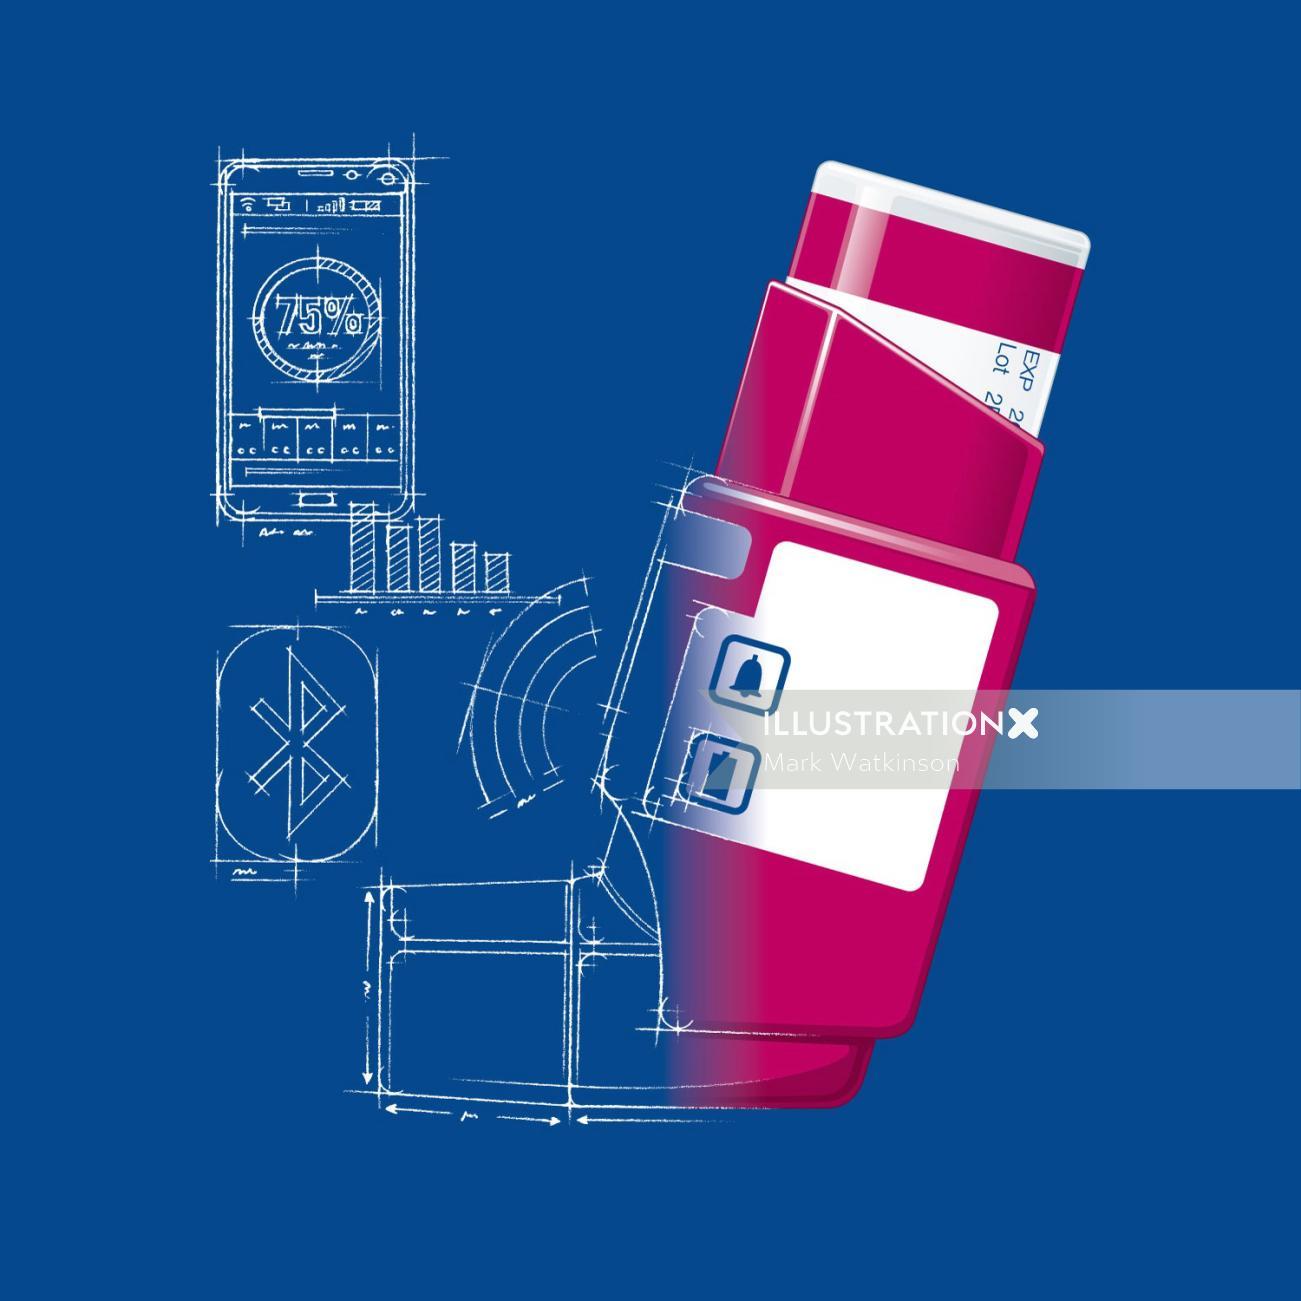 Communication illustration of mobile applications